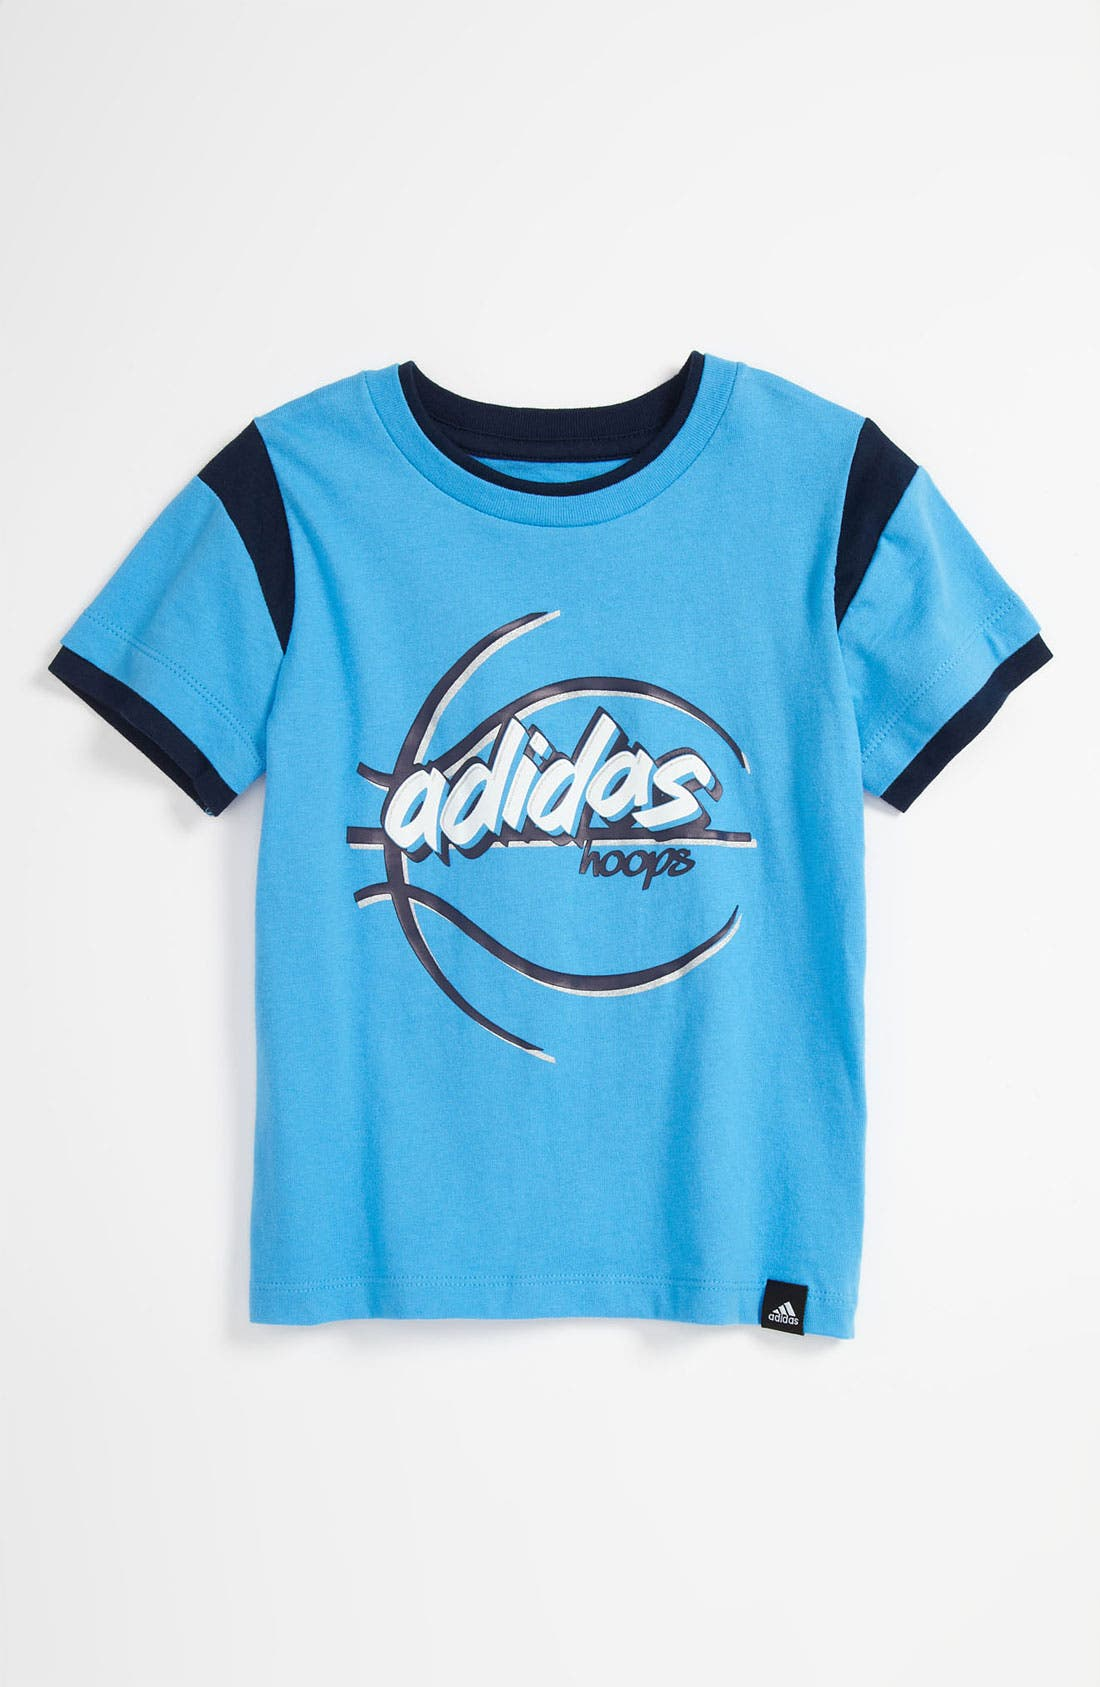 Main Image - adidas 'Can't Lose' T-Shirt (Toddler)